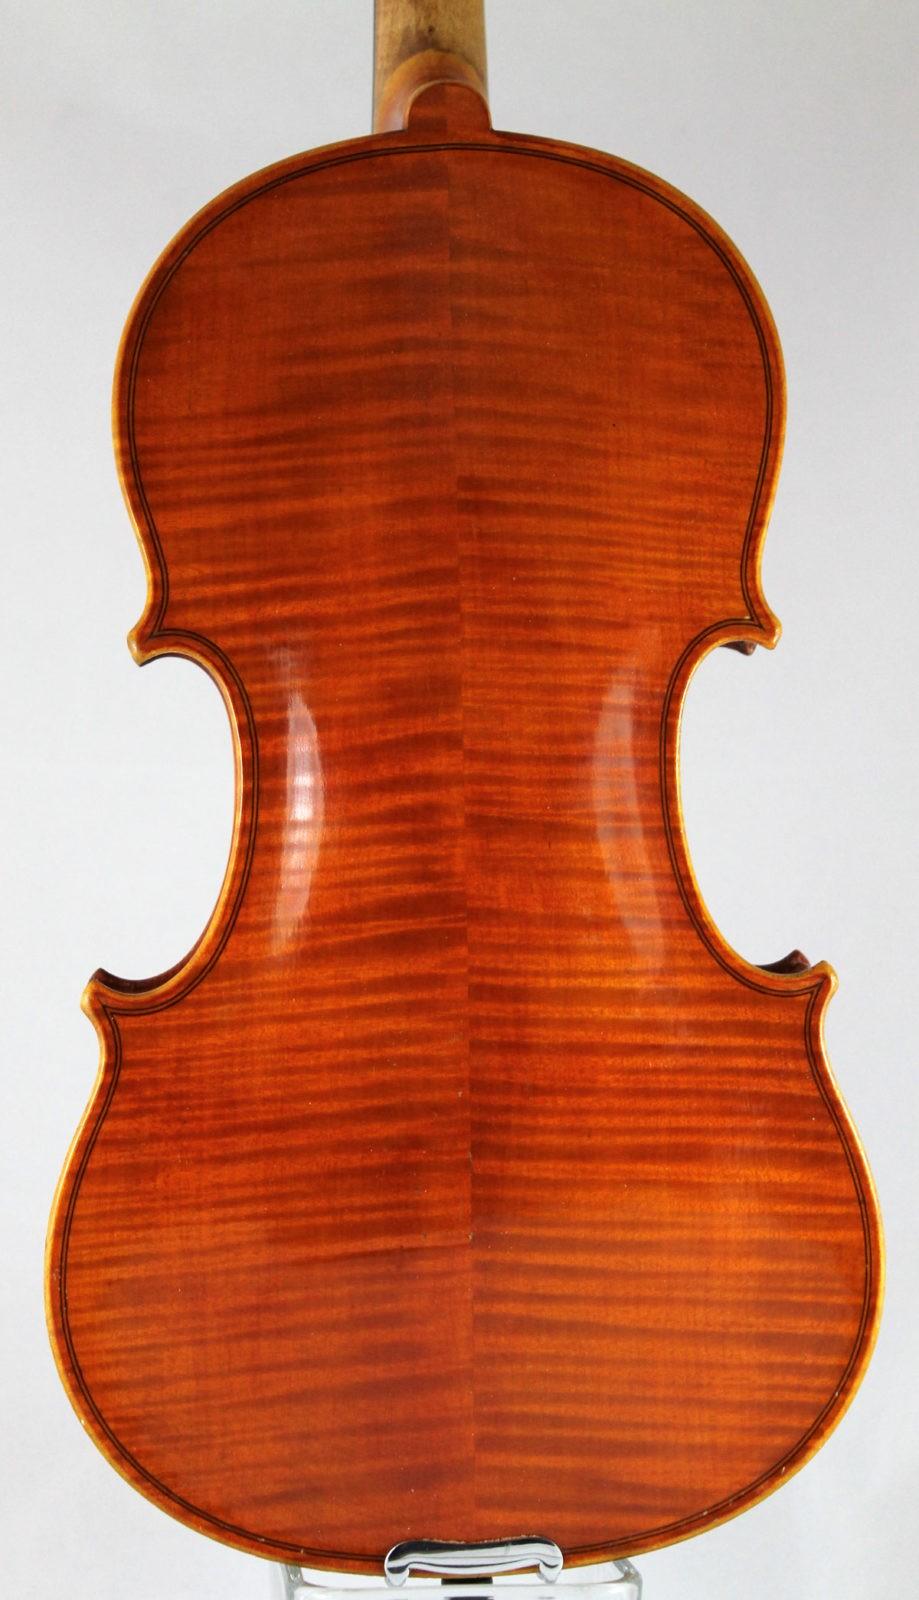 Heinrich Th Heberlein Jr violin - back